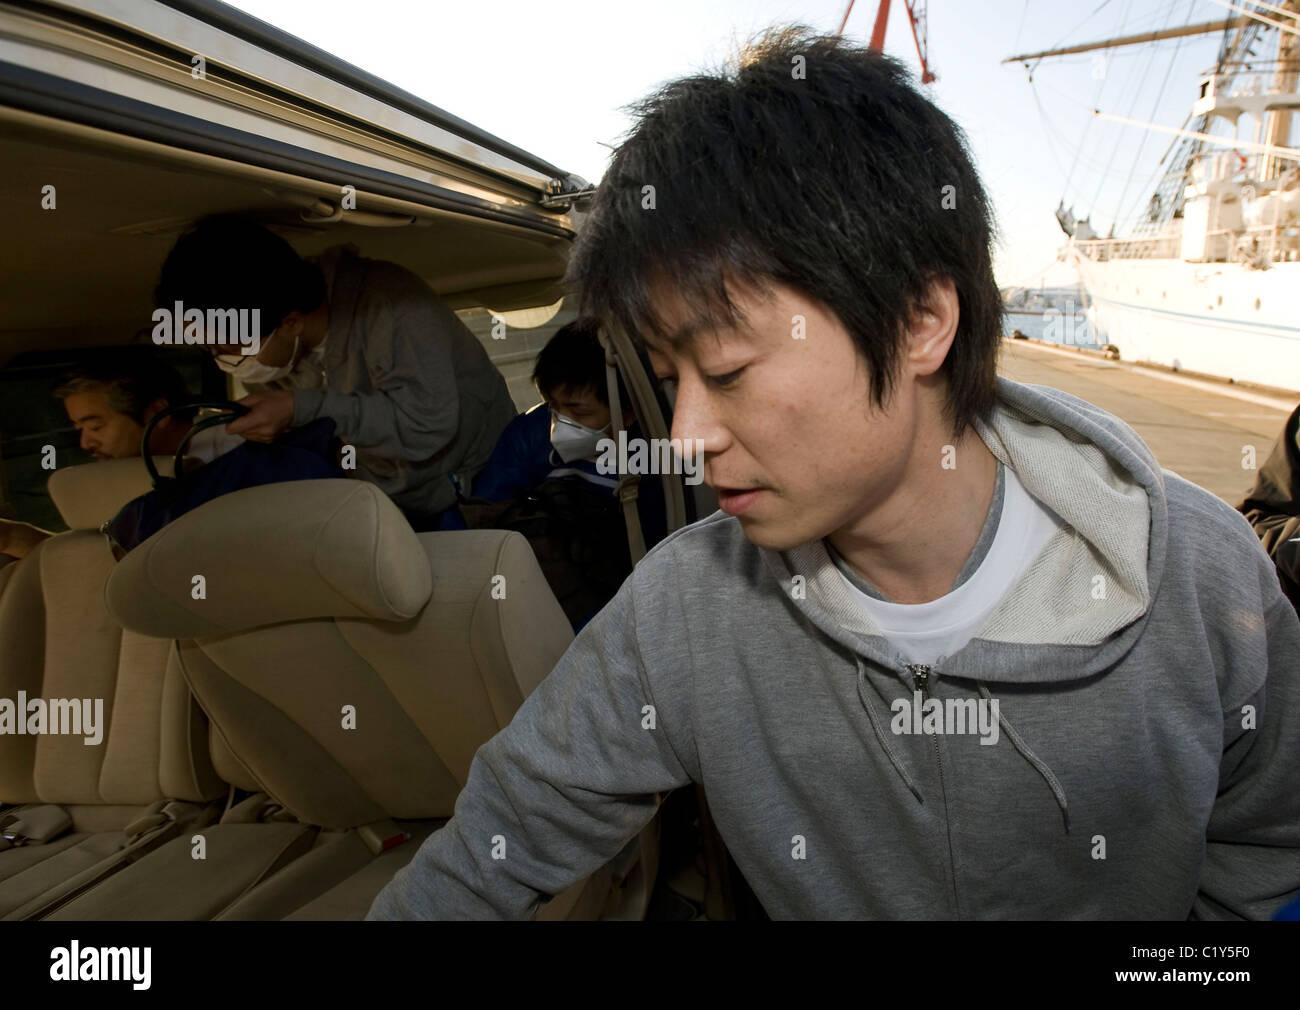 Akira Tamura, a member of the so-called Fukushima 50 alights from a vehicle prior to boarding the Kaiwomaru - Stock Image